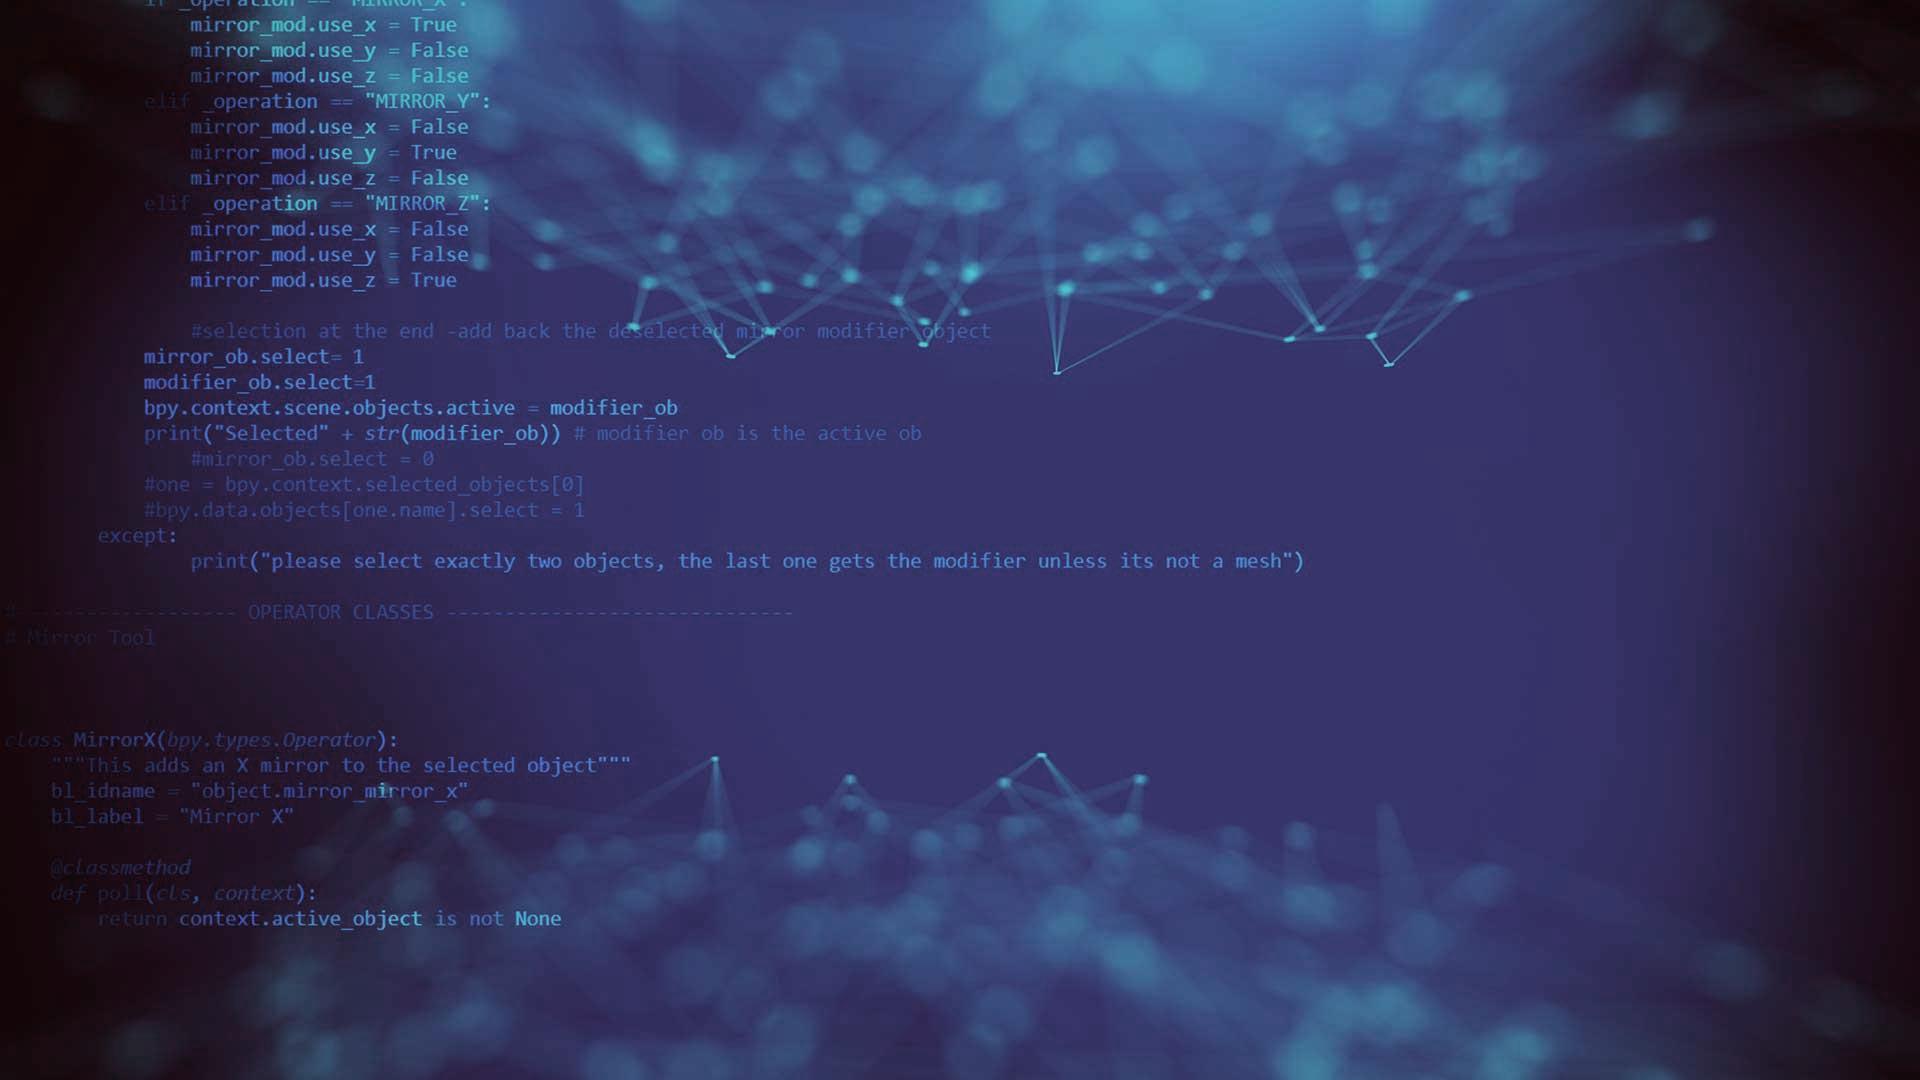 Image of code on blue background